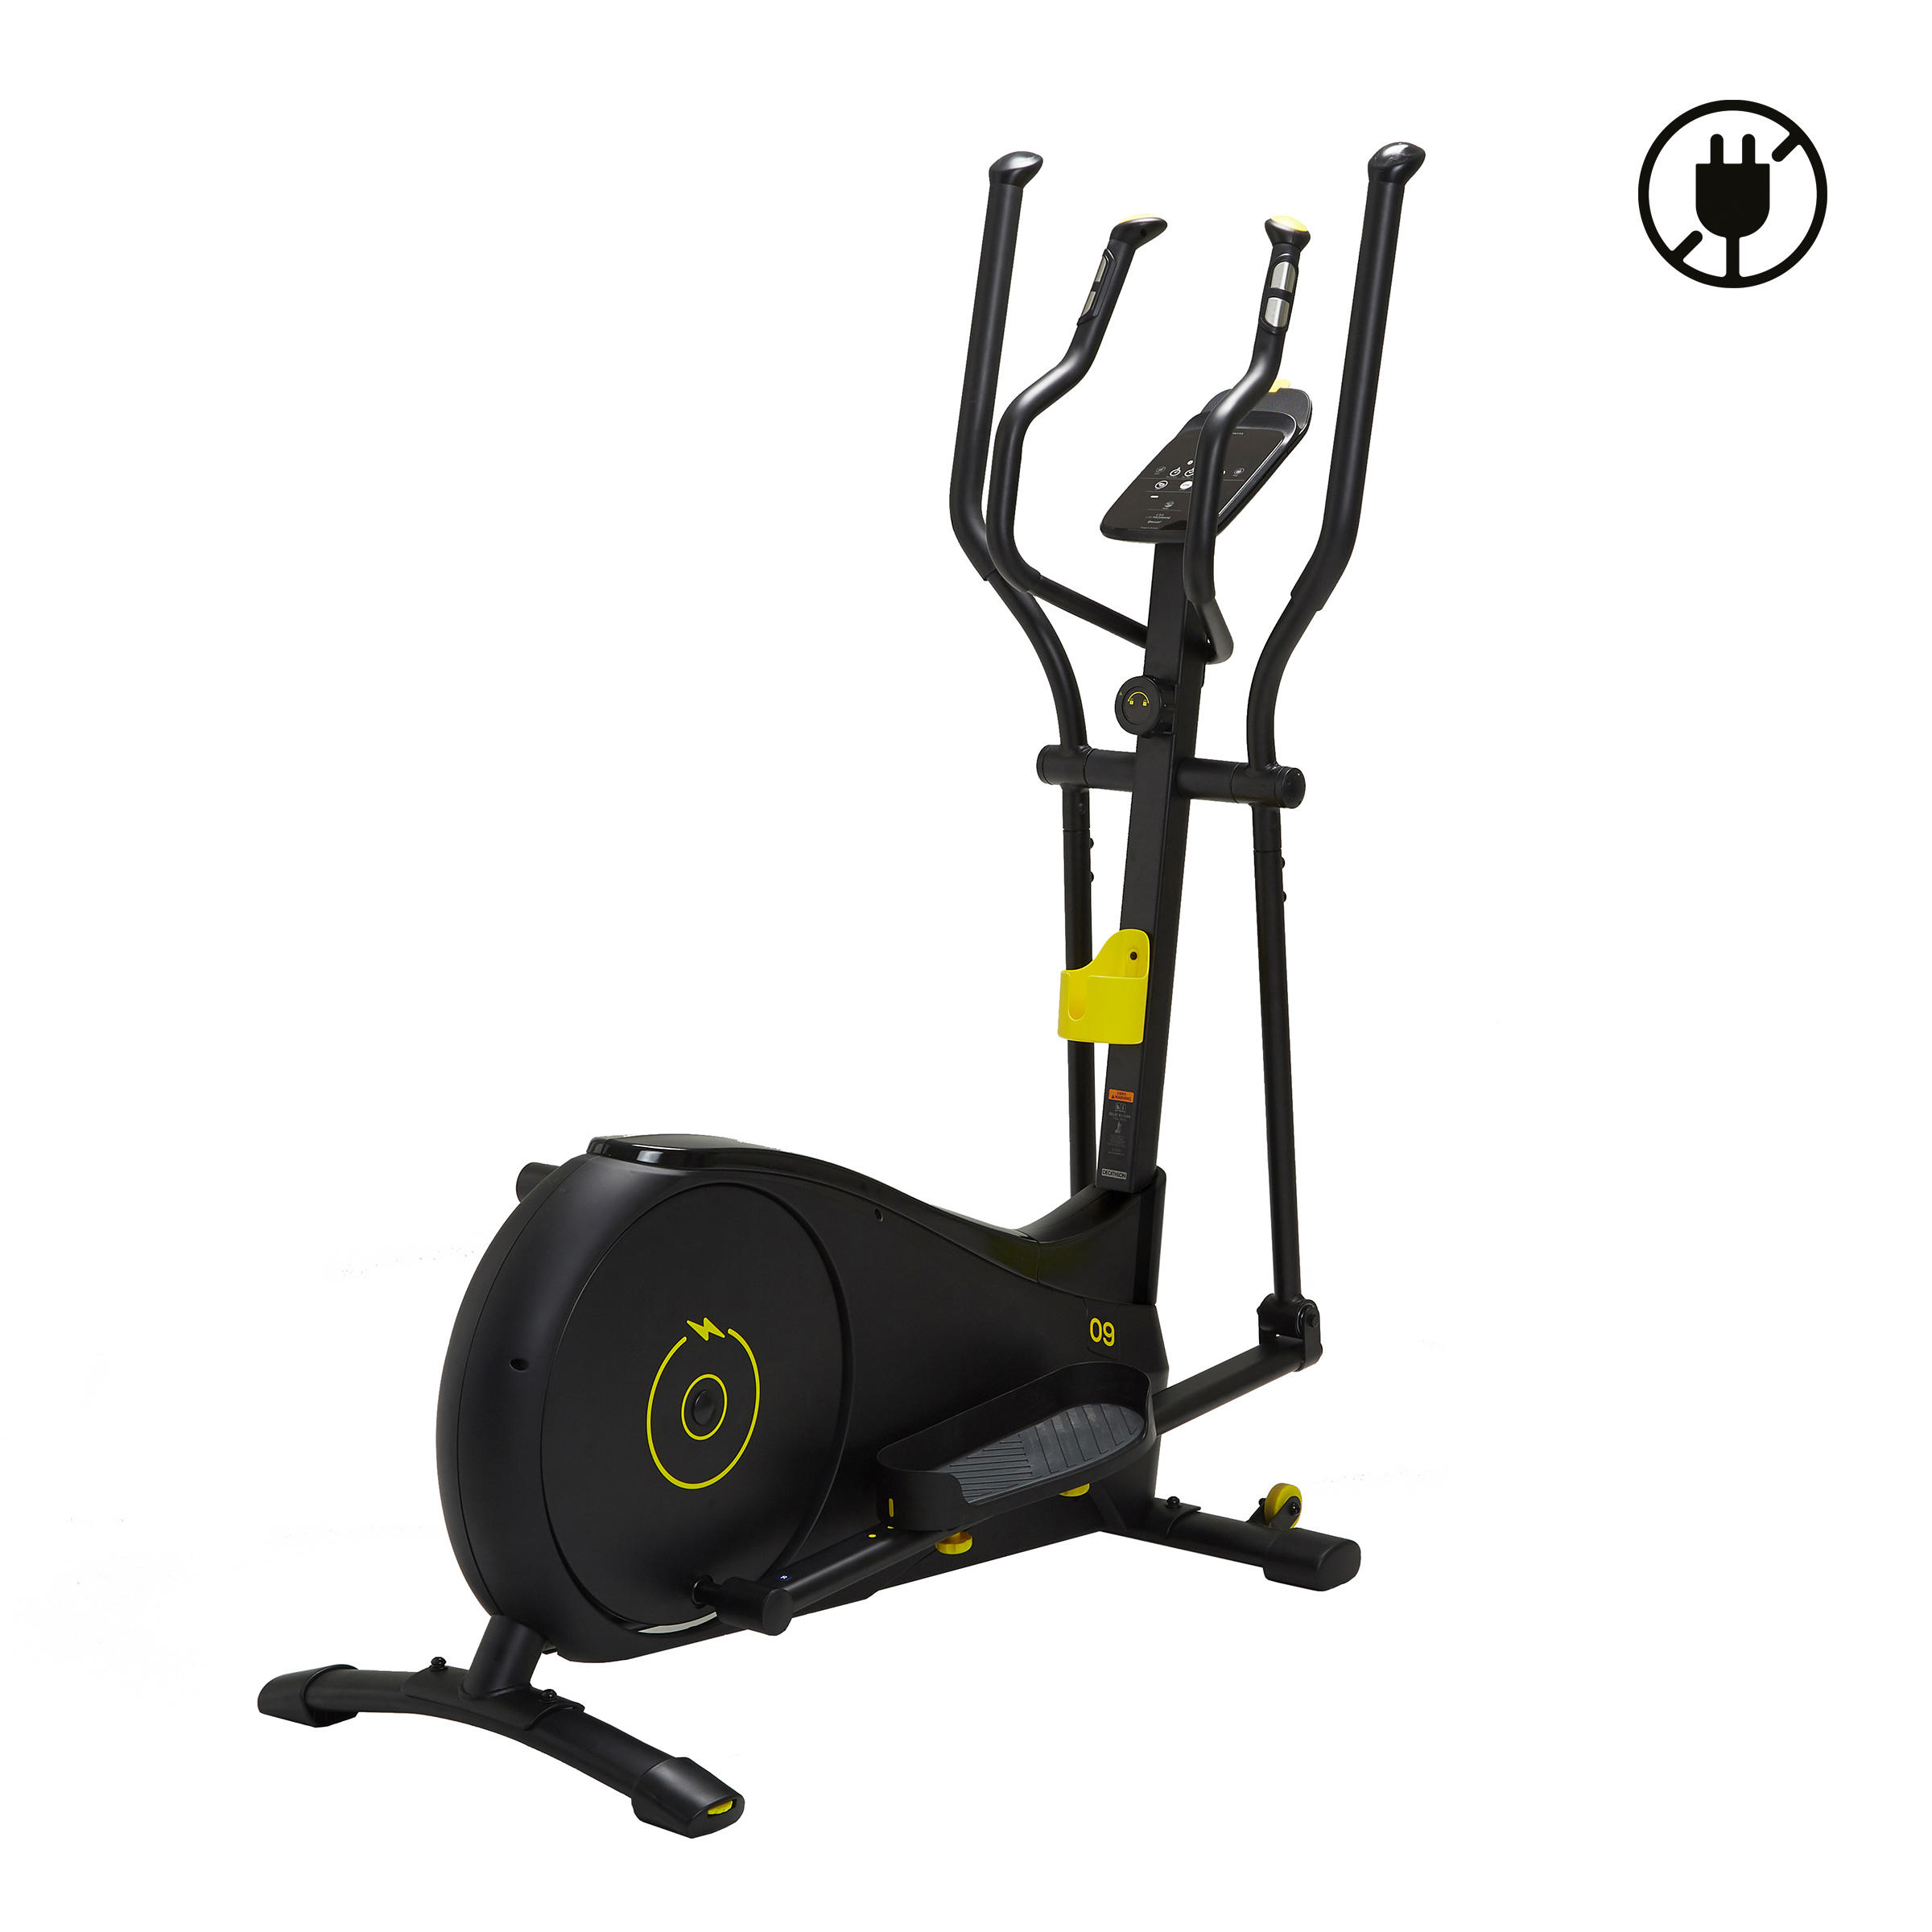 Buy Elliptical Cross Trainers online at